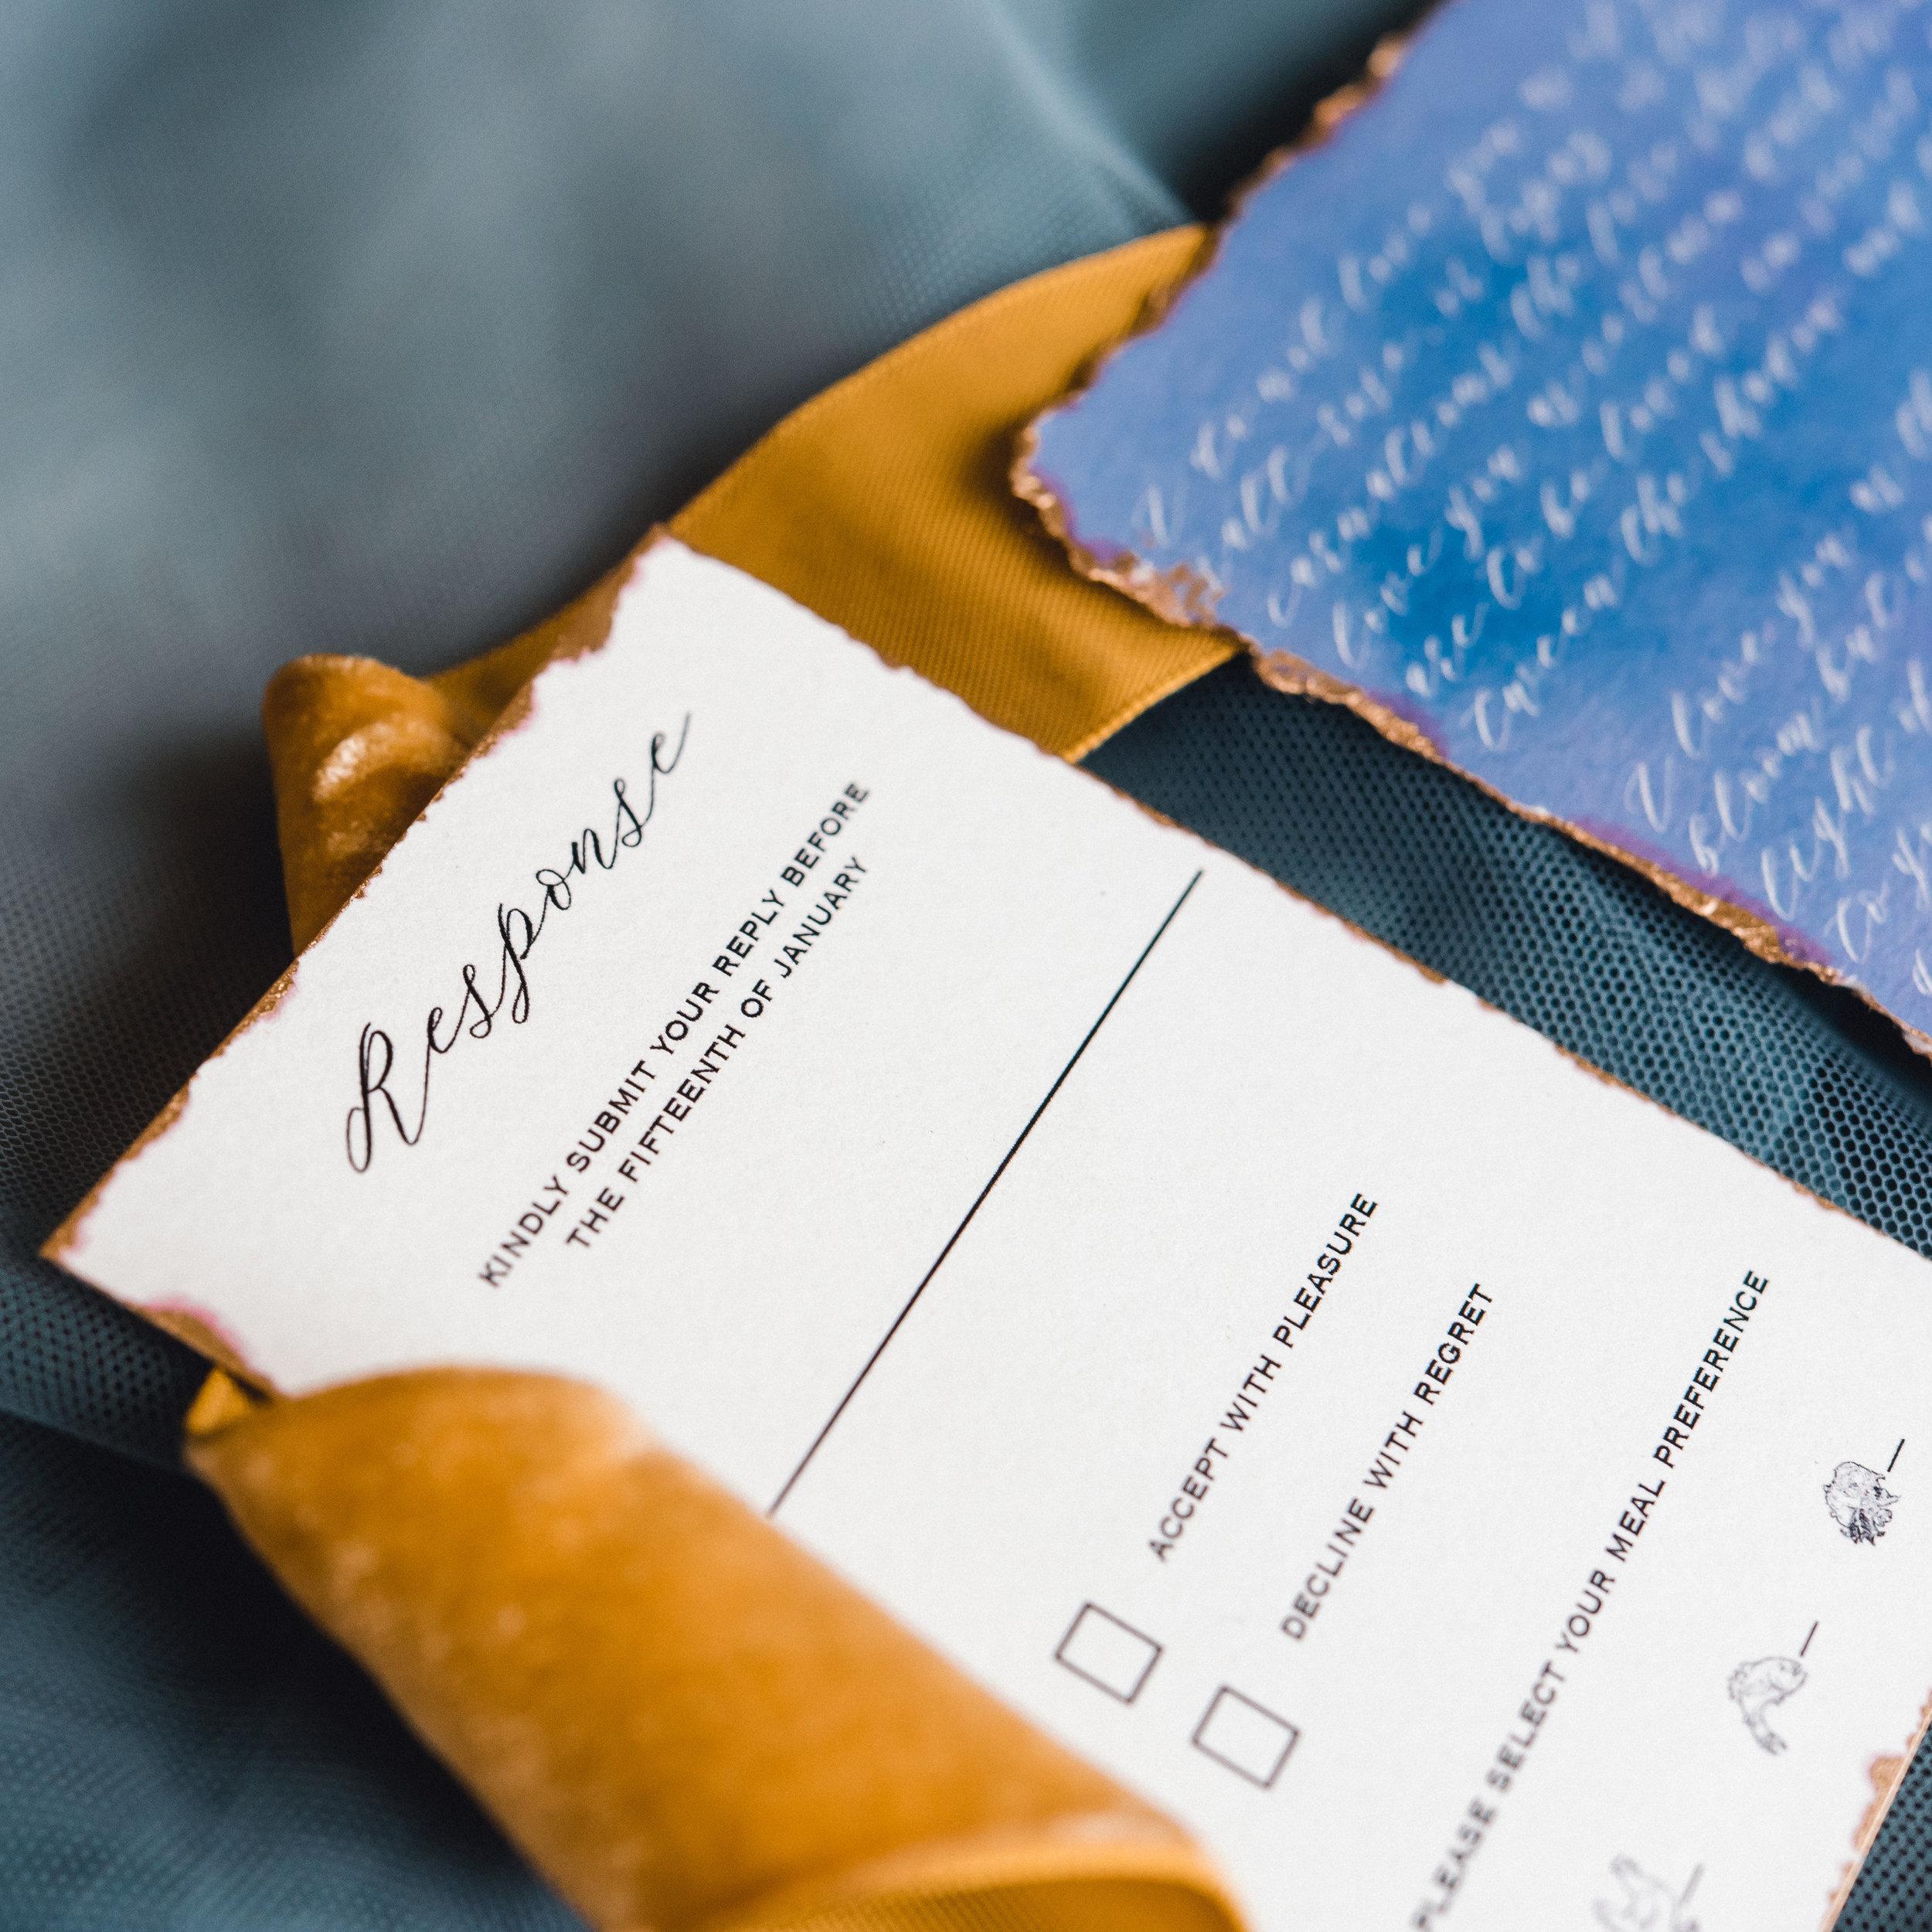 gold-painted-wedding-invitations-by-k-flowers-designs.jpg